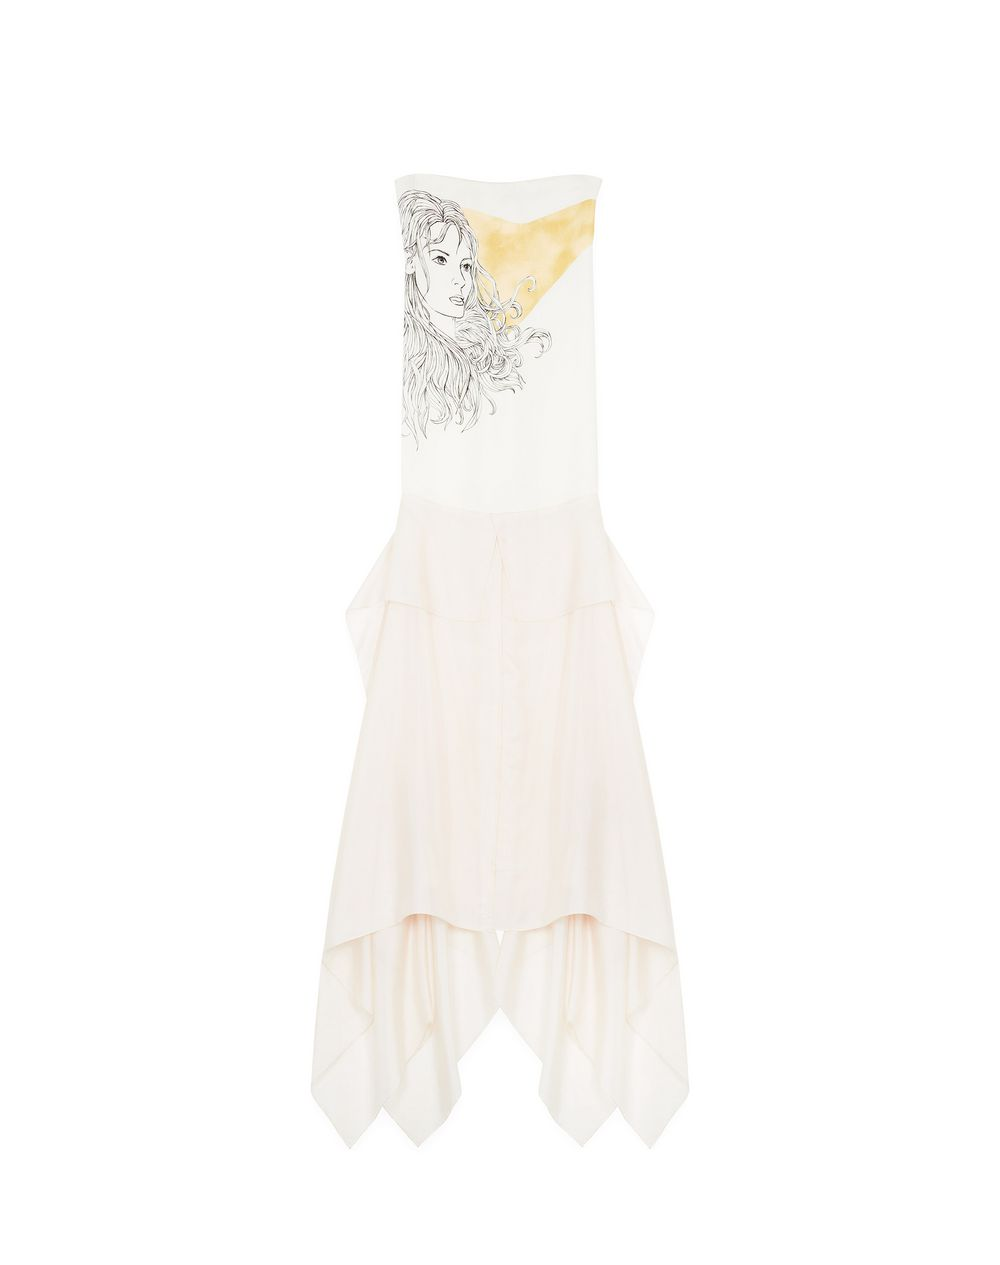 PRINTED SILK BUSTIER DRESS - Lanvin